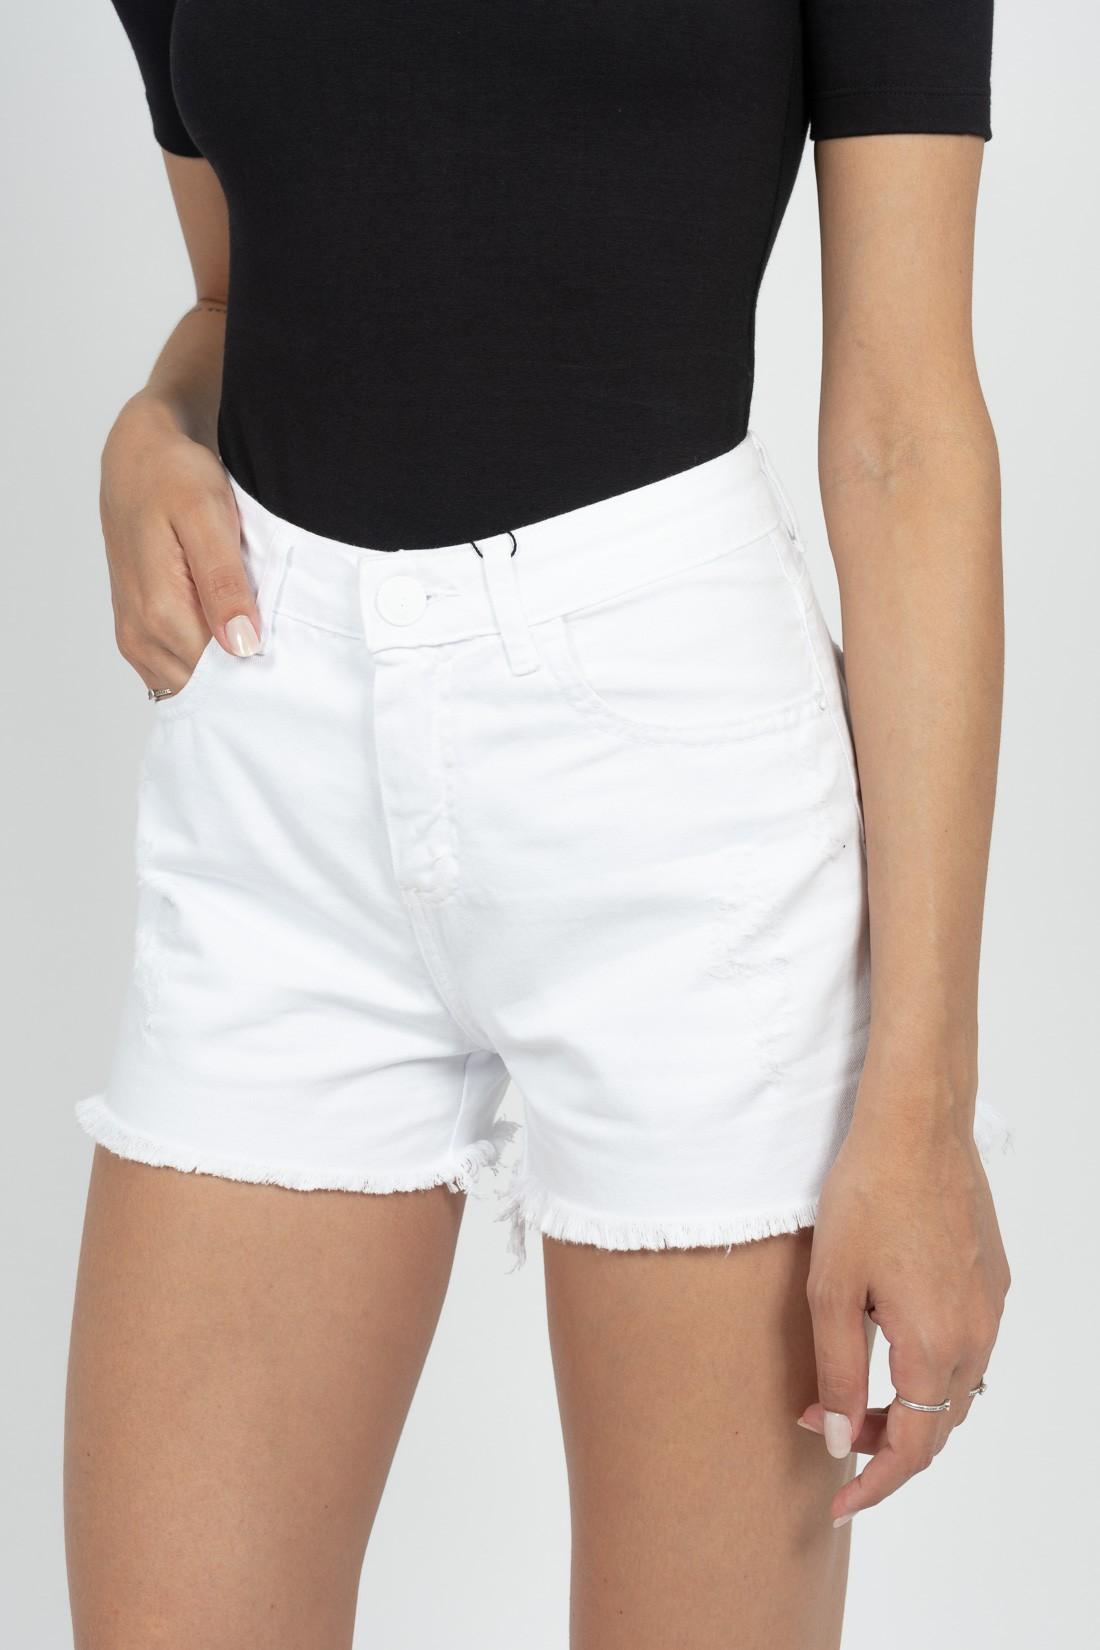 Shorts Hering Barra Desfiada